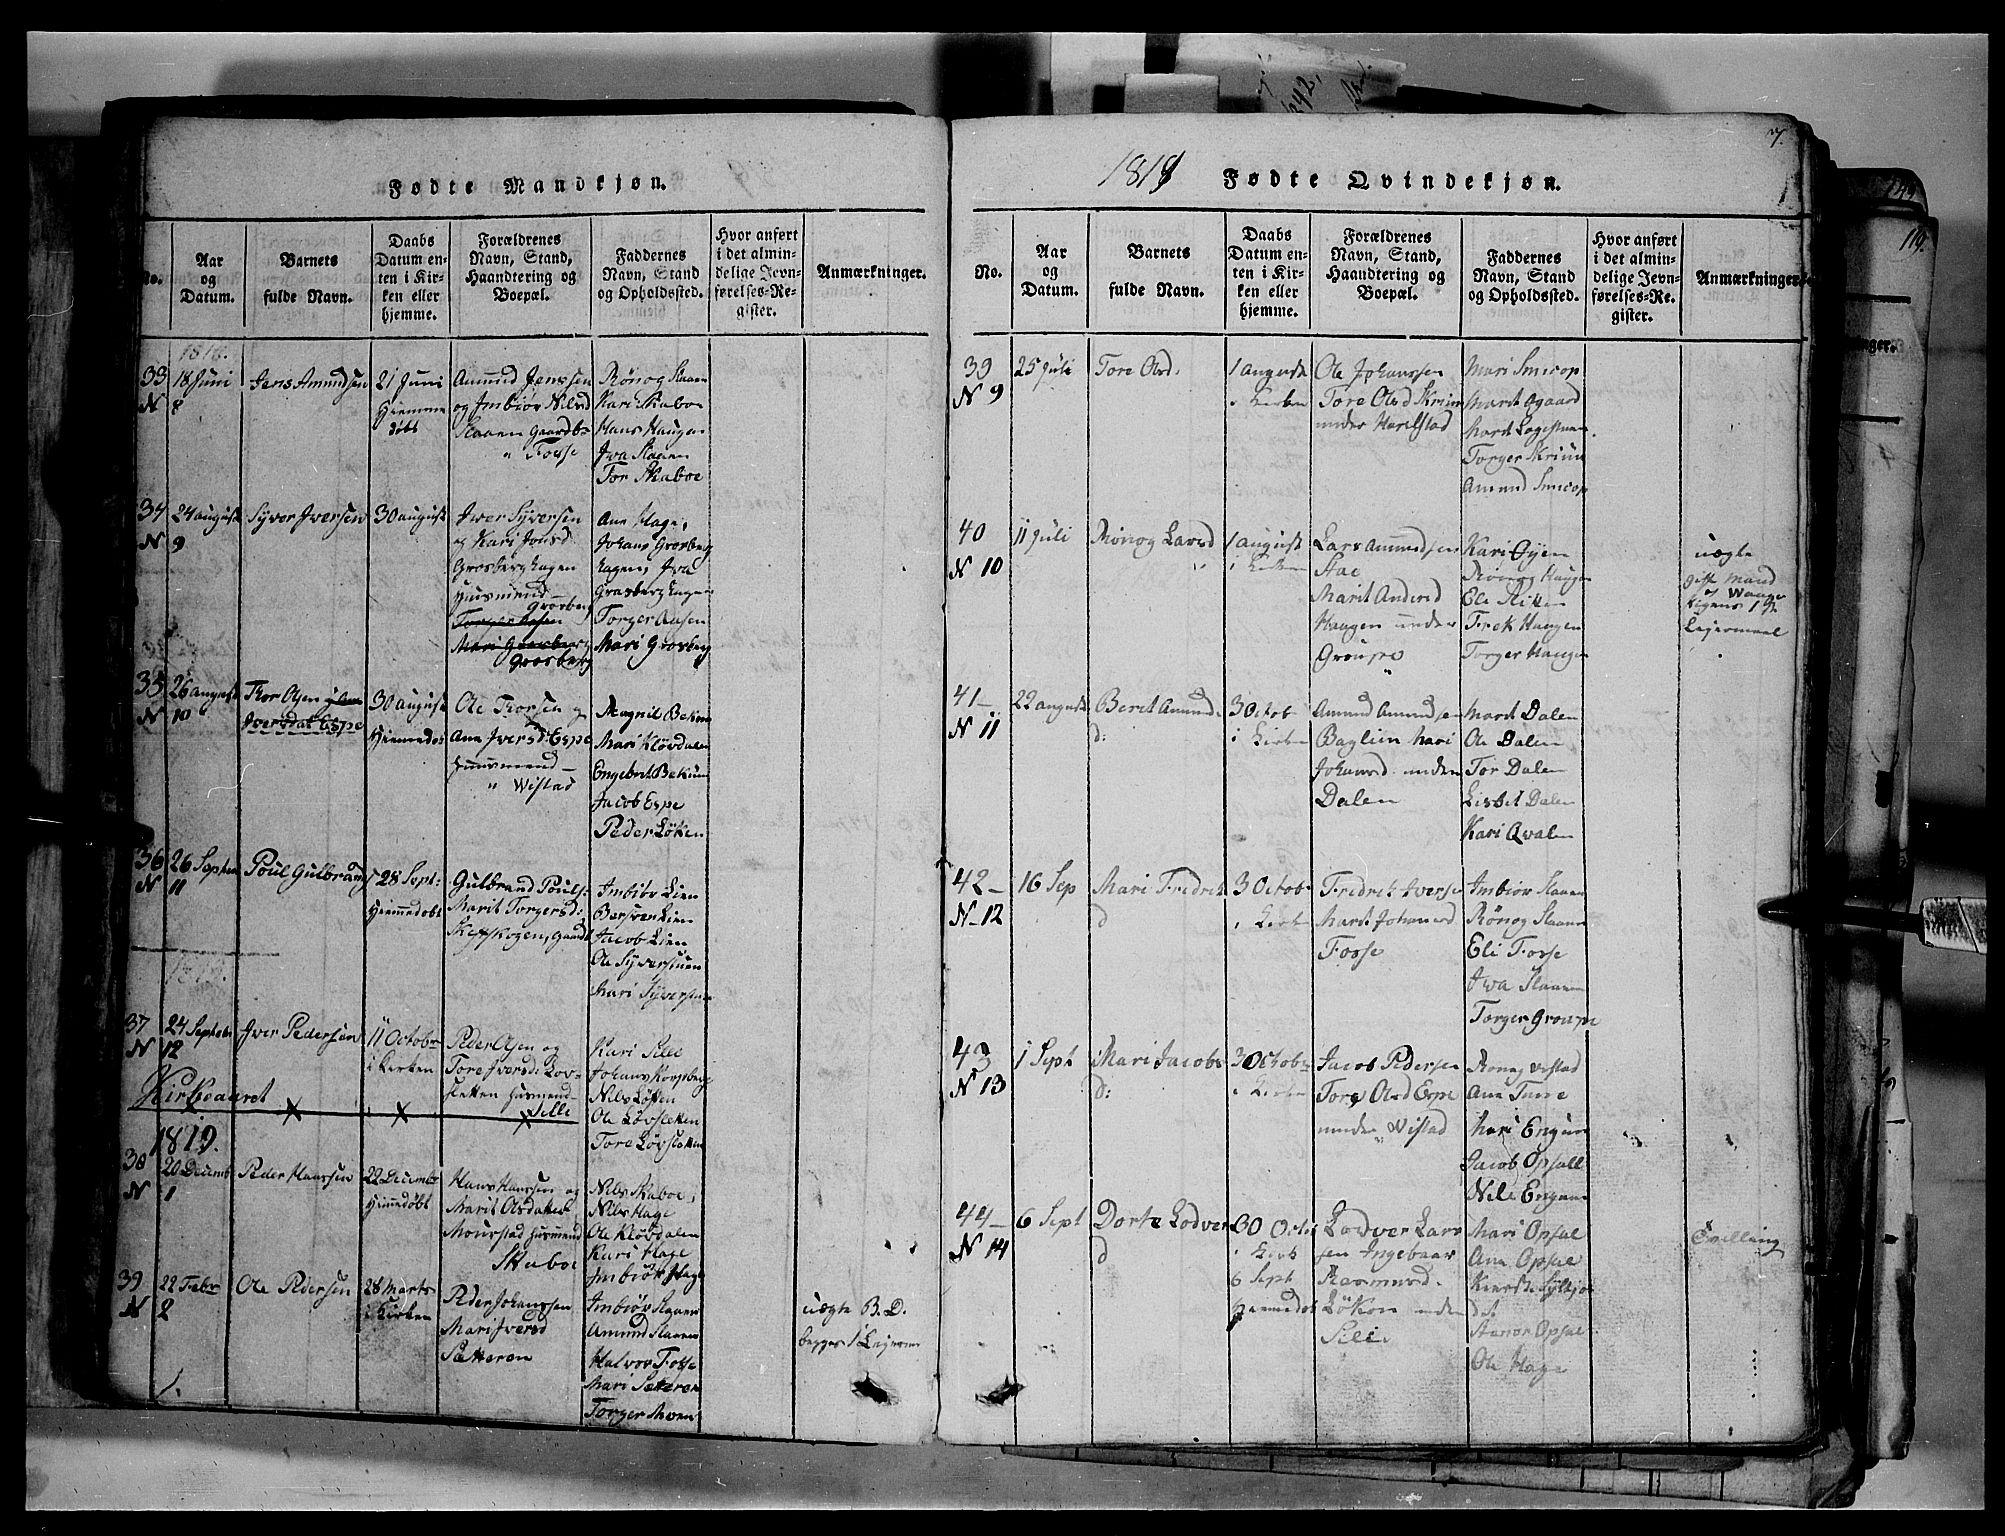 SAH, Fron prestekontor, H/Ha/Hab/L0003: Klokkerbok nr. 3, 1816-1850, s. 7